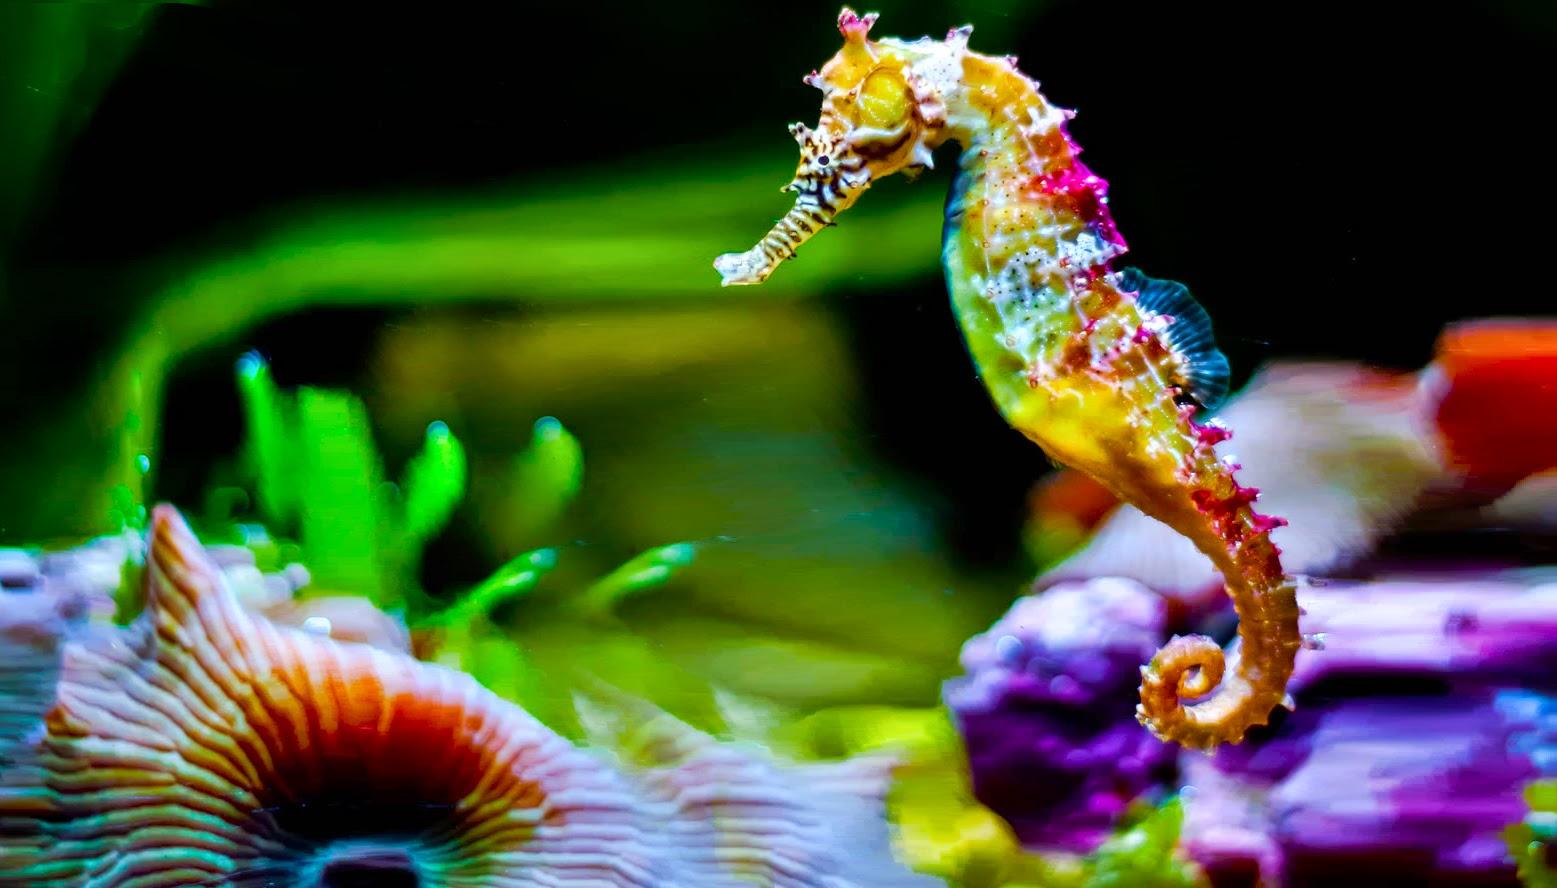 Ver fotos de caballos de mar